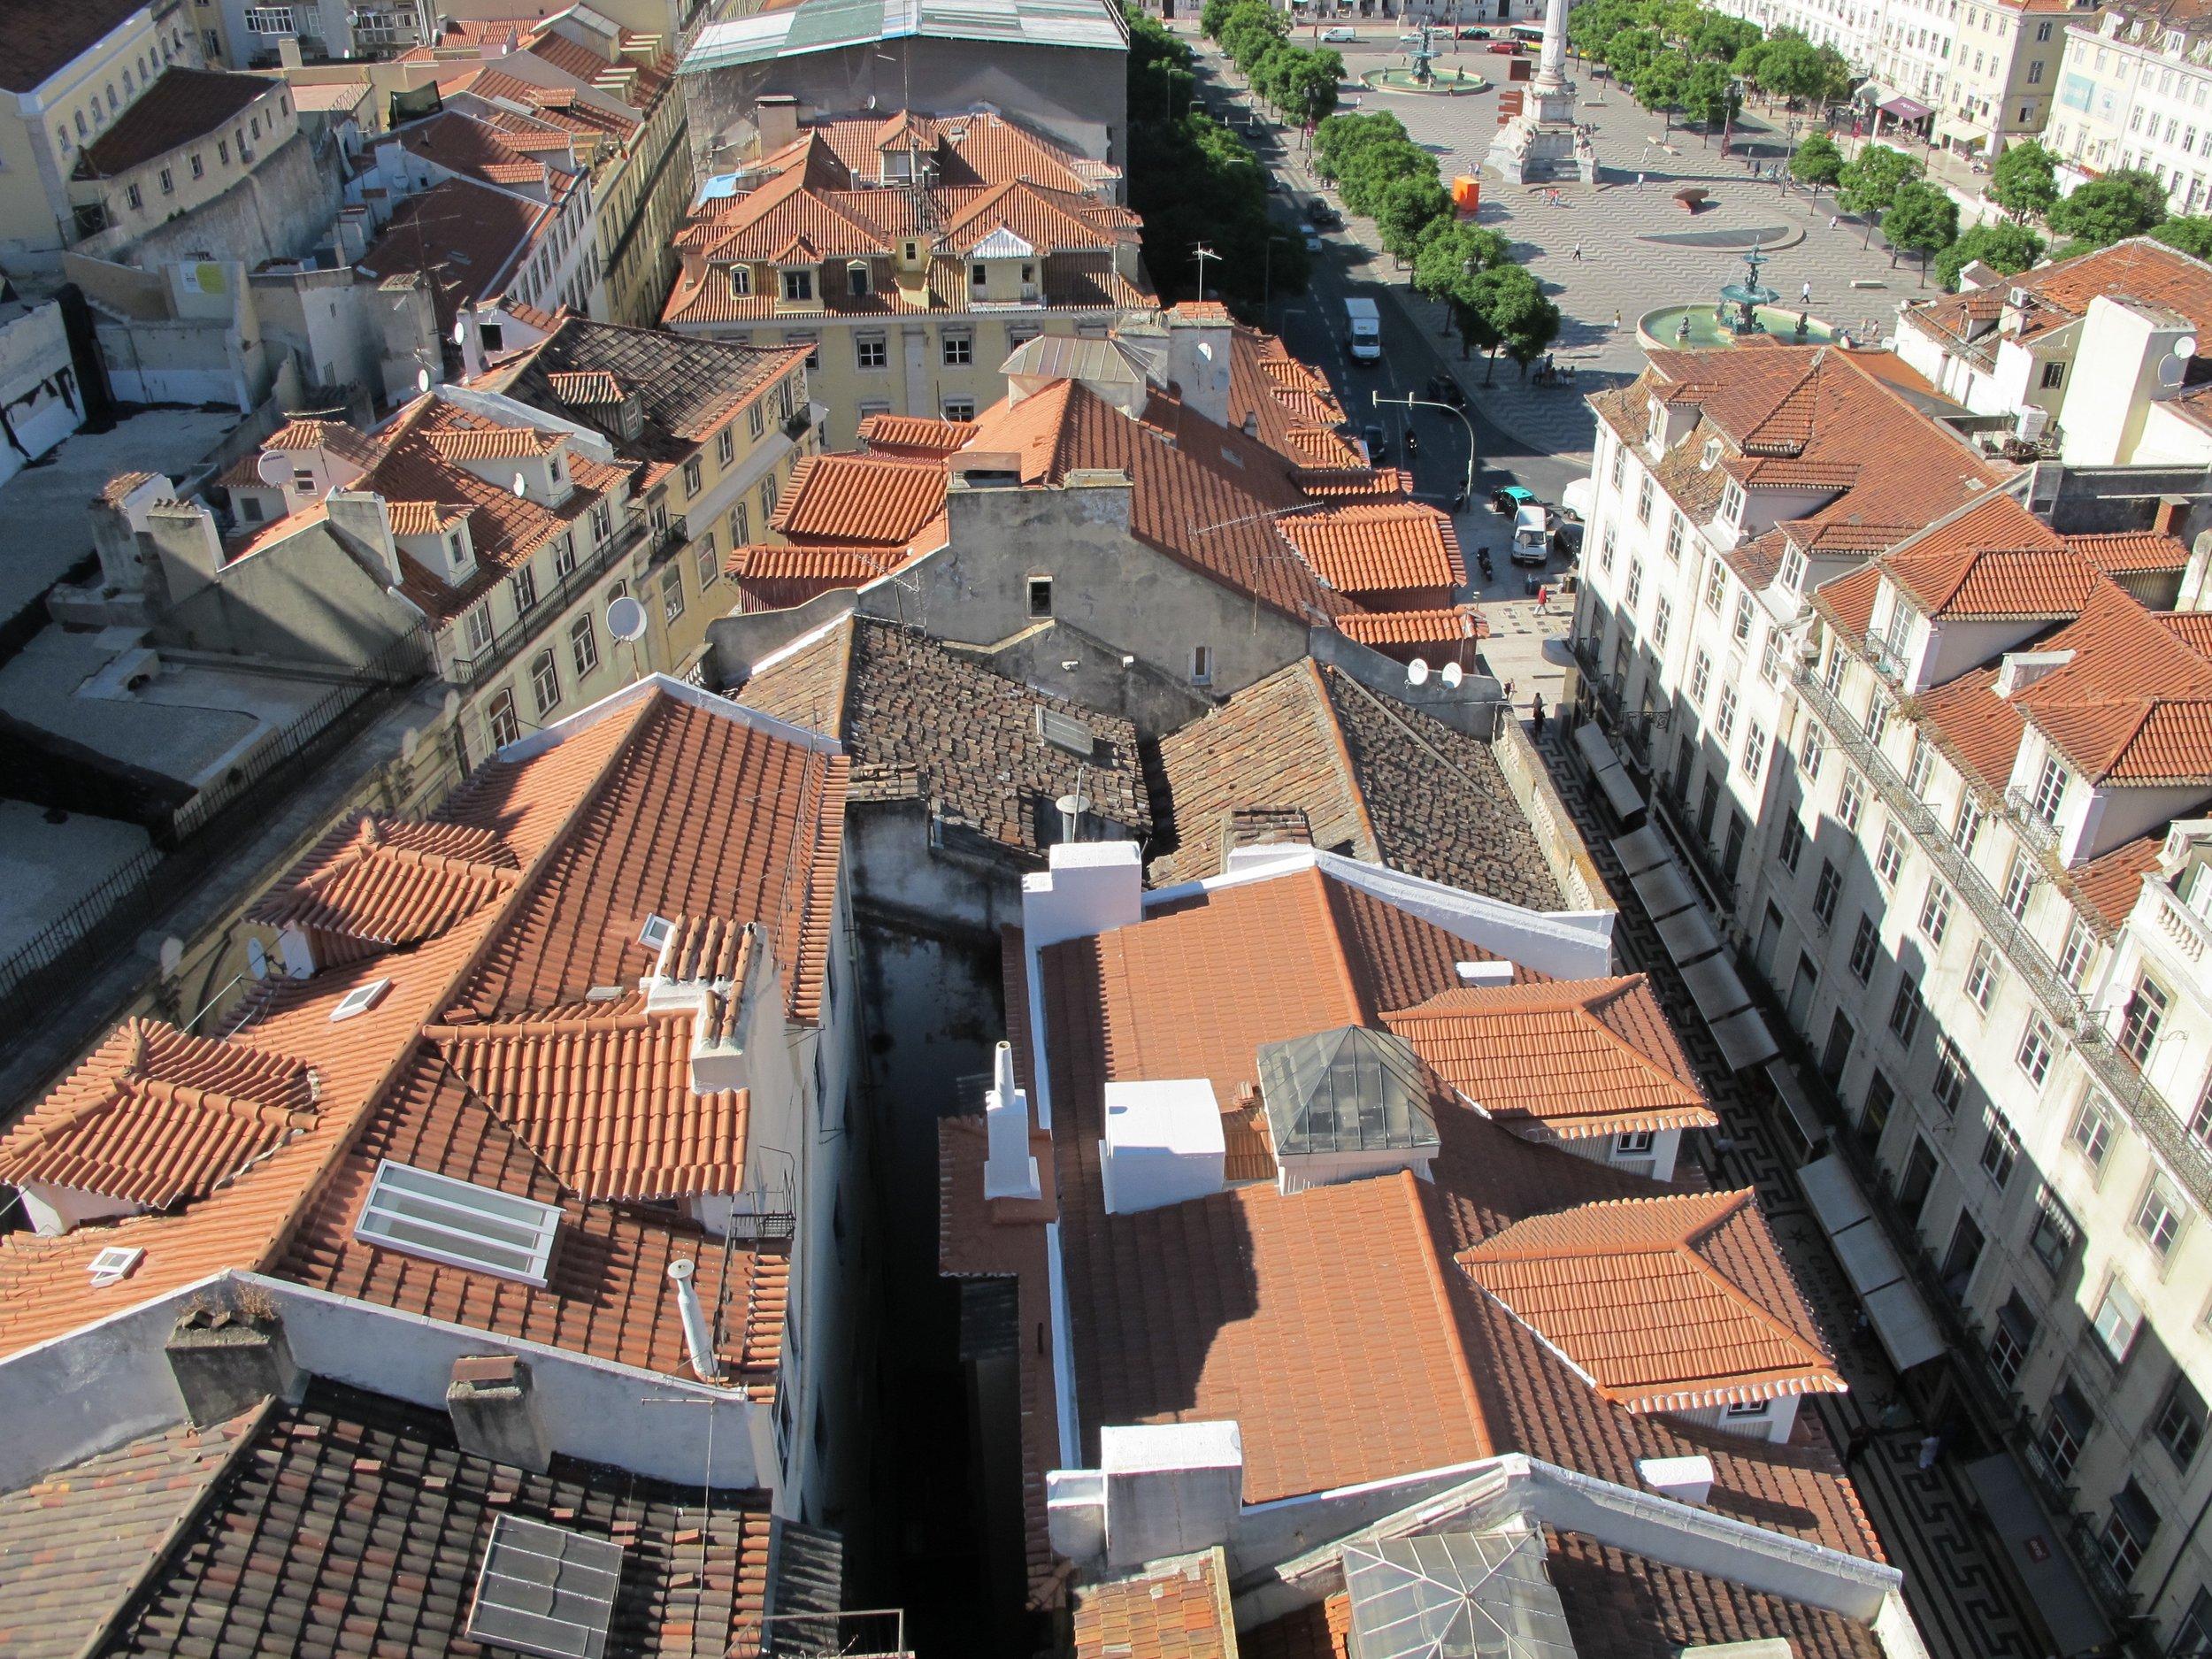 Building-rooftops.jpg